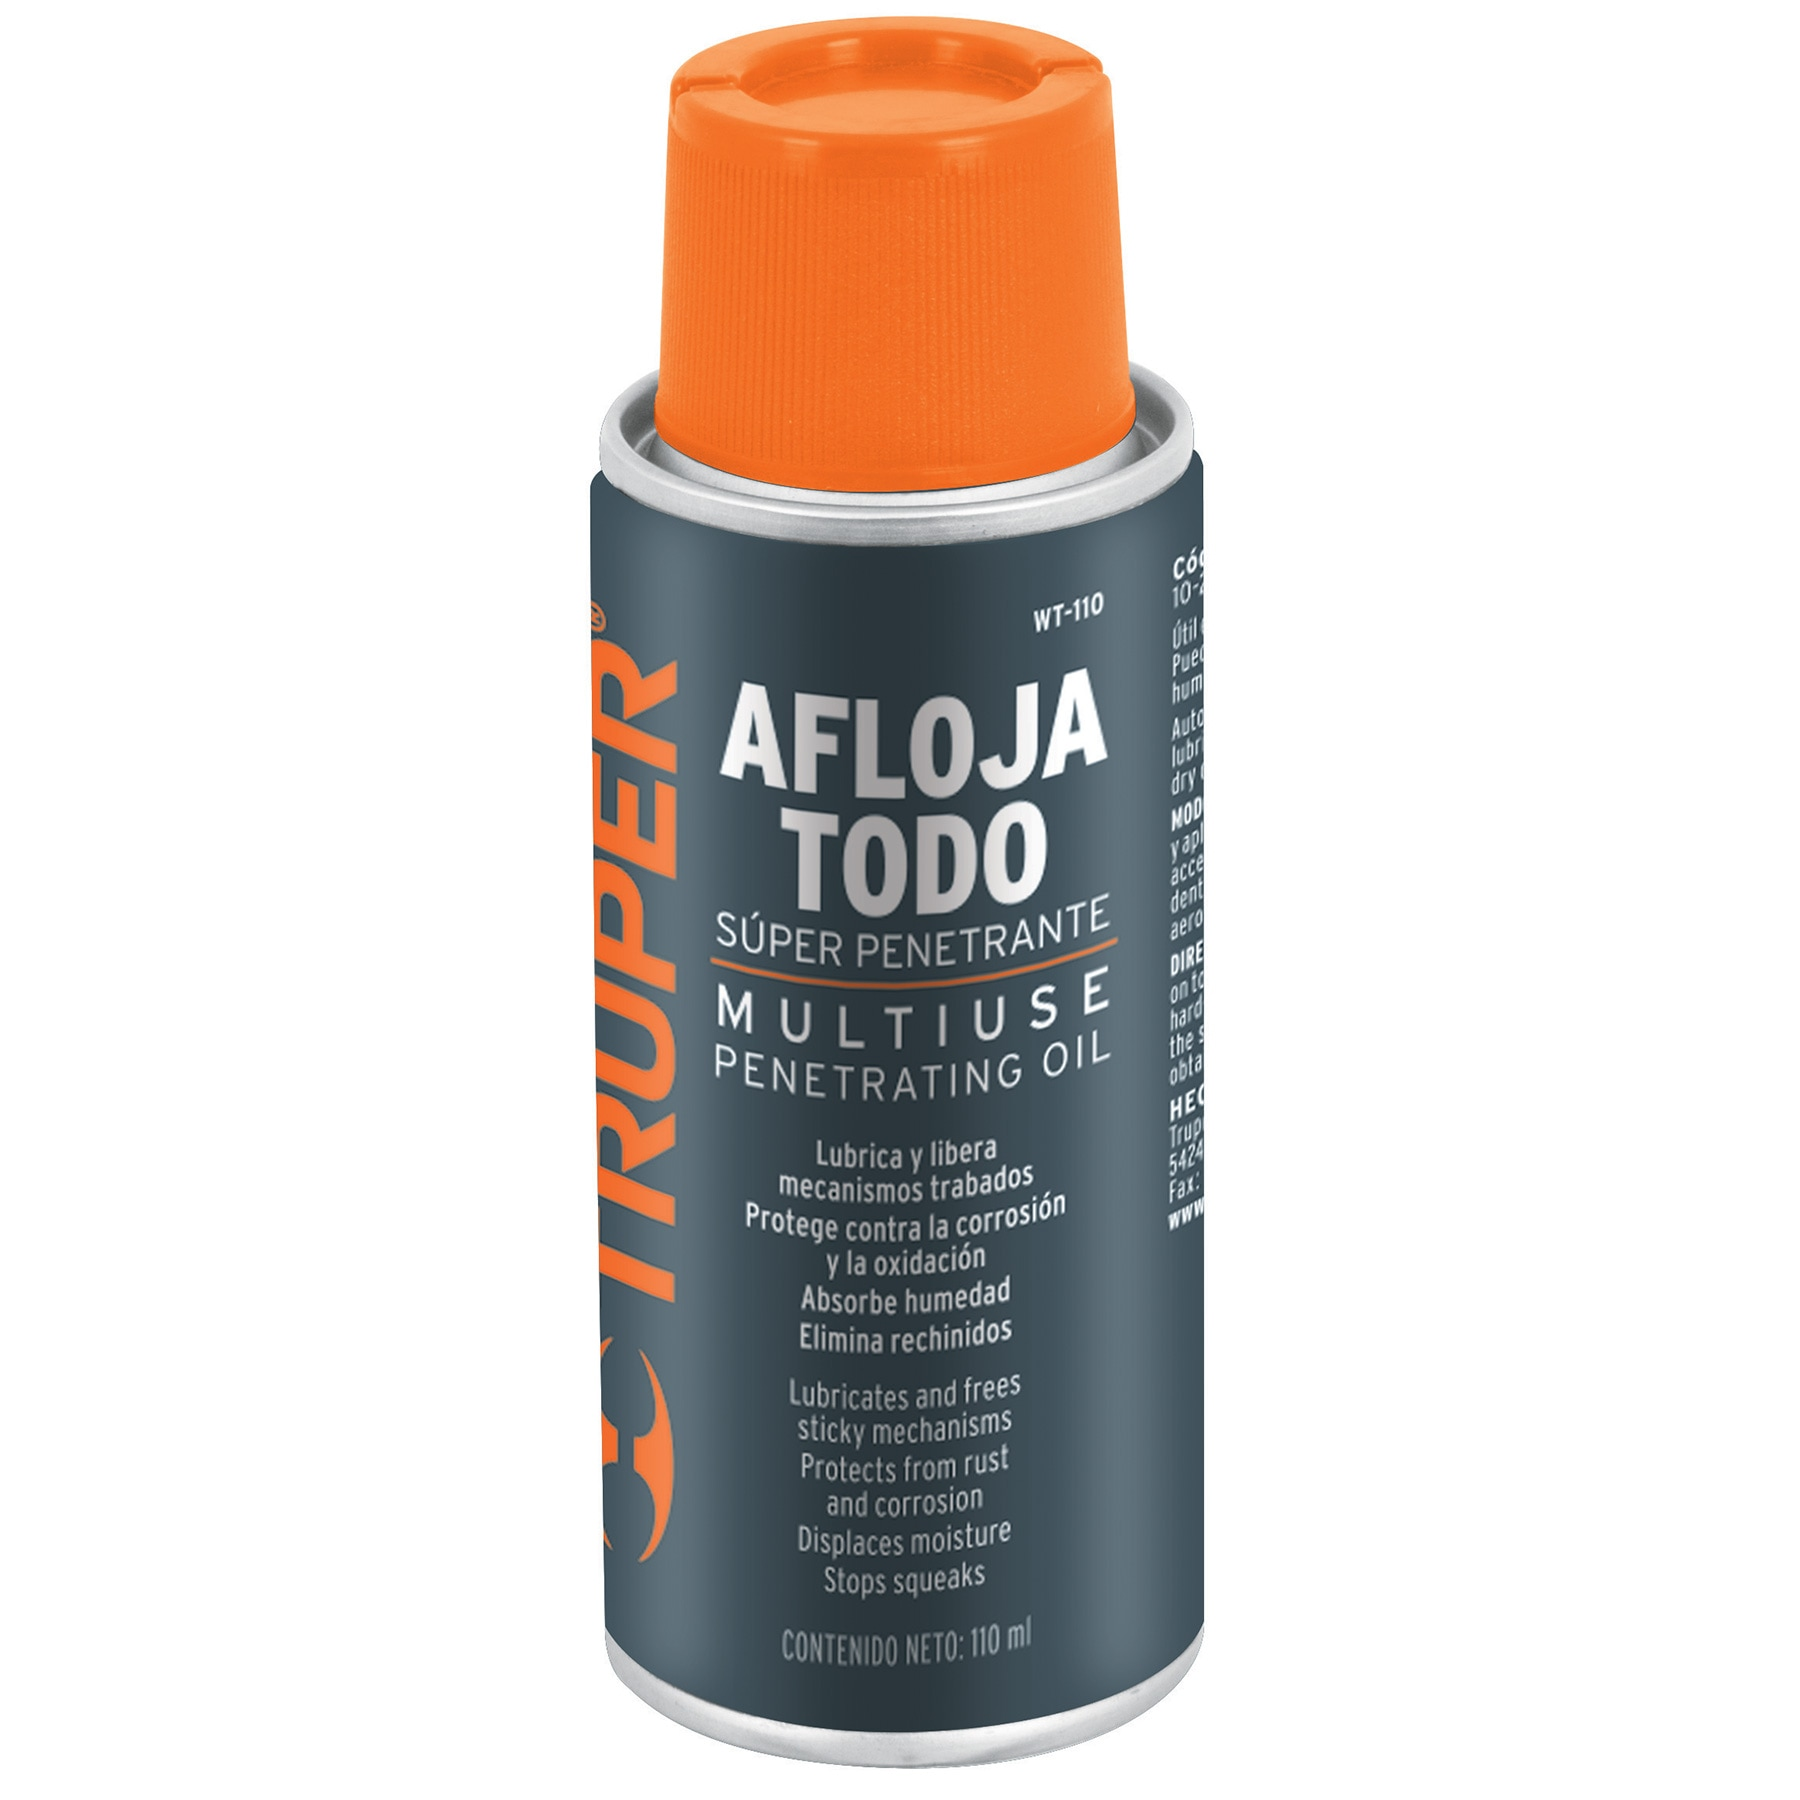 Aceite aflojatodo en aerosol, 110 ml